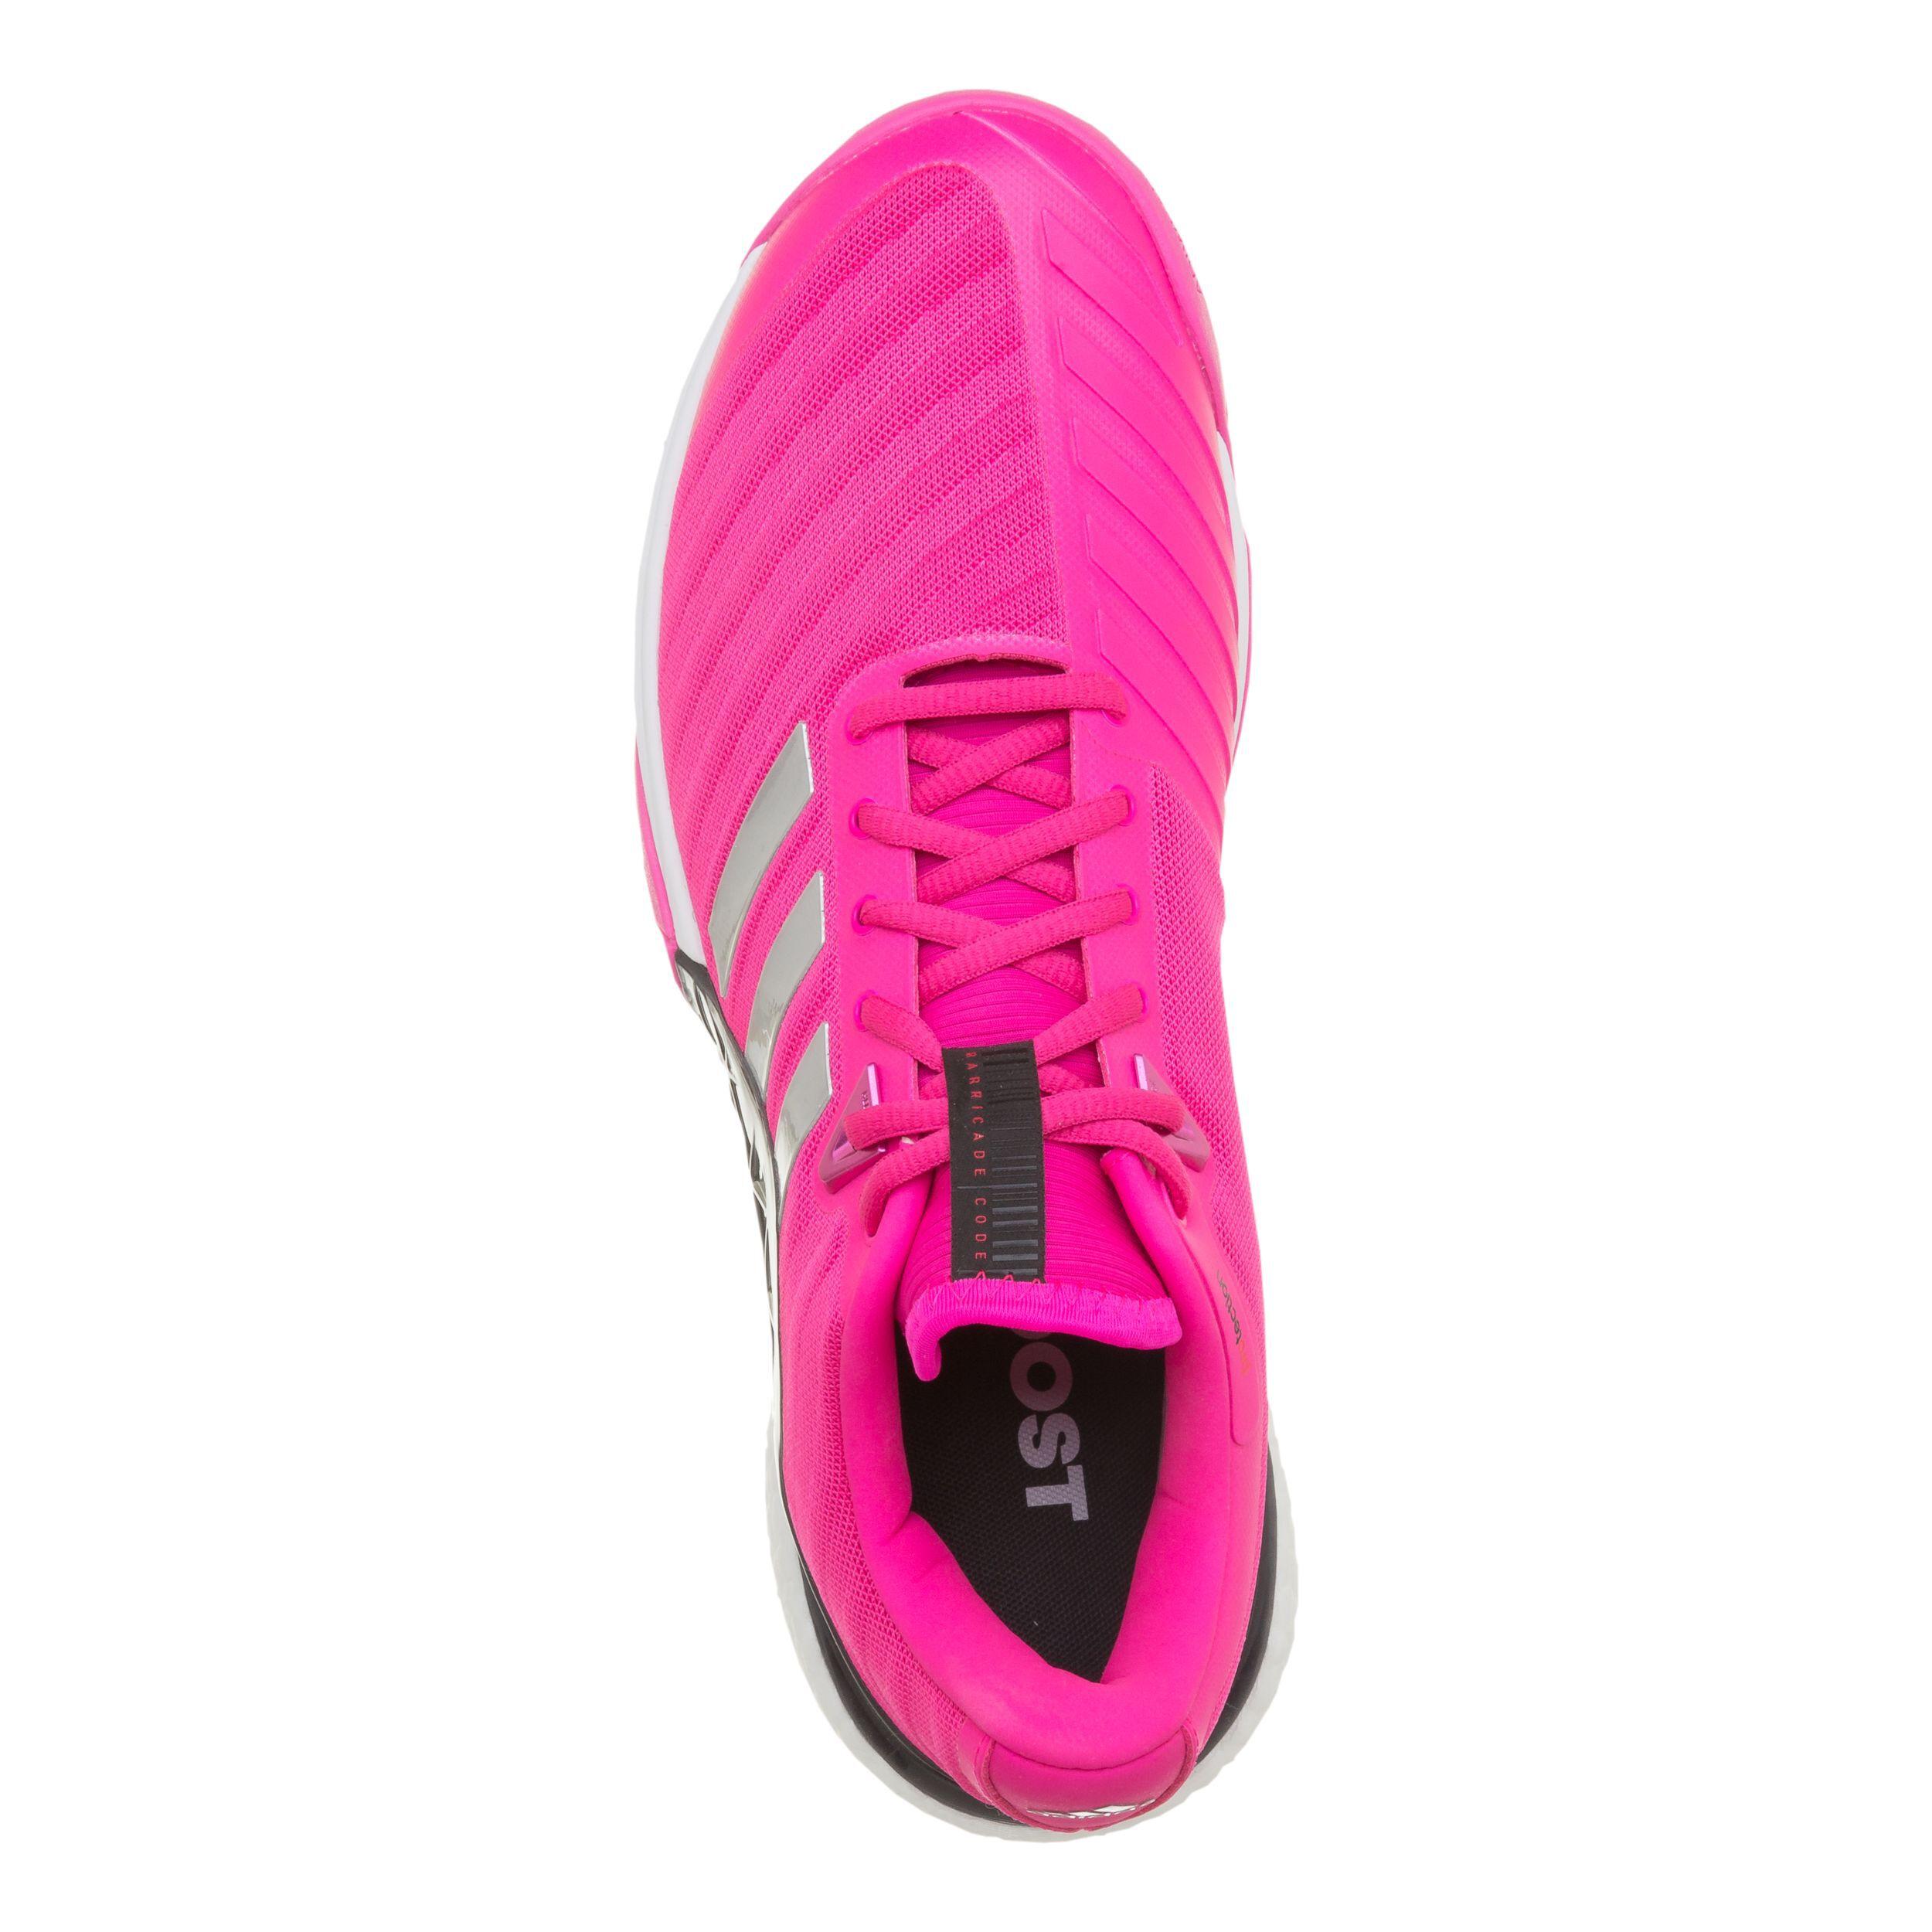 adidas barricade 2018 boost pink